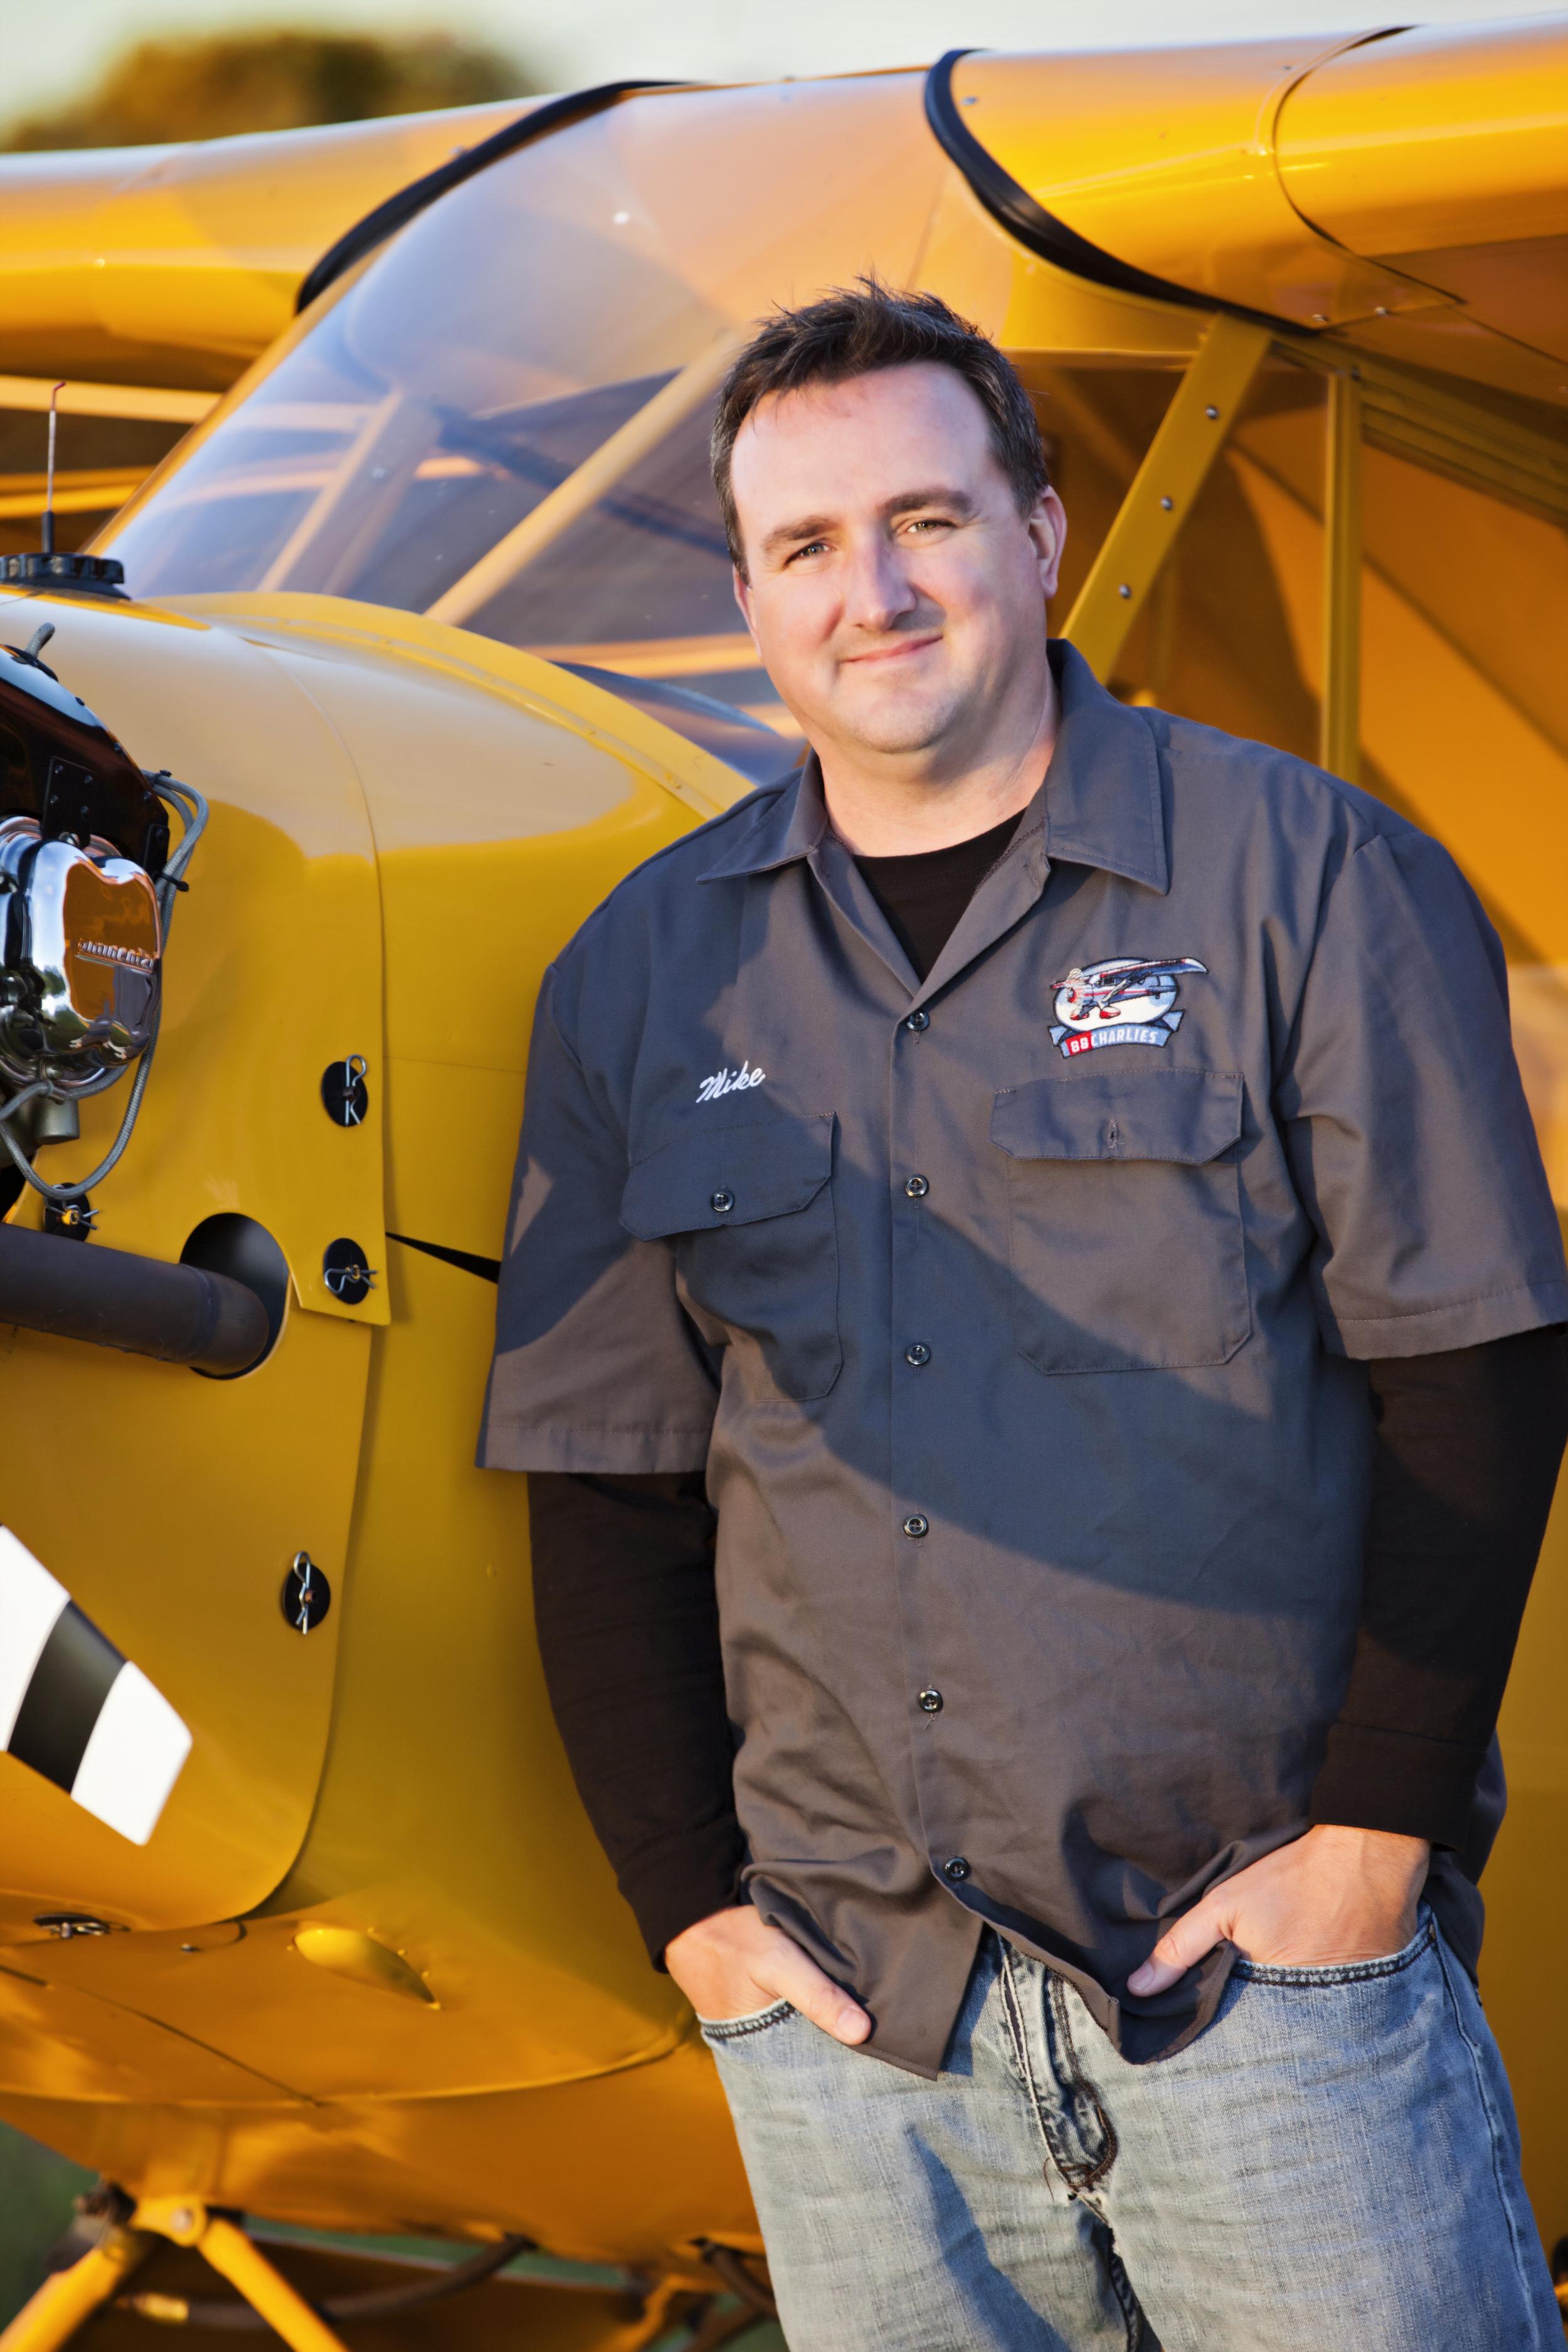 Michael Rosman - Founder/Director  mrosman@88charlies.com  (262) 378-9805